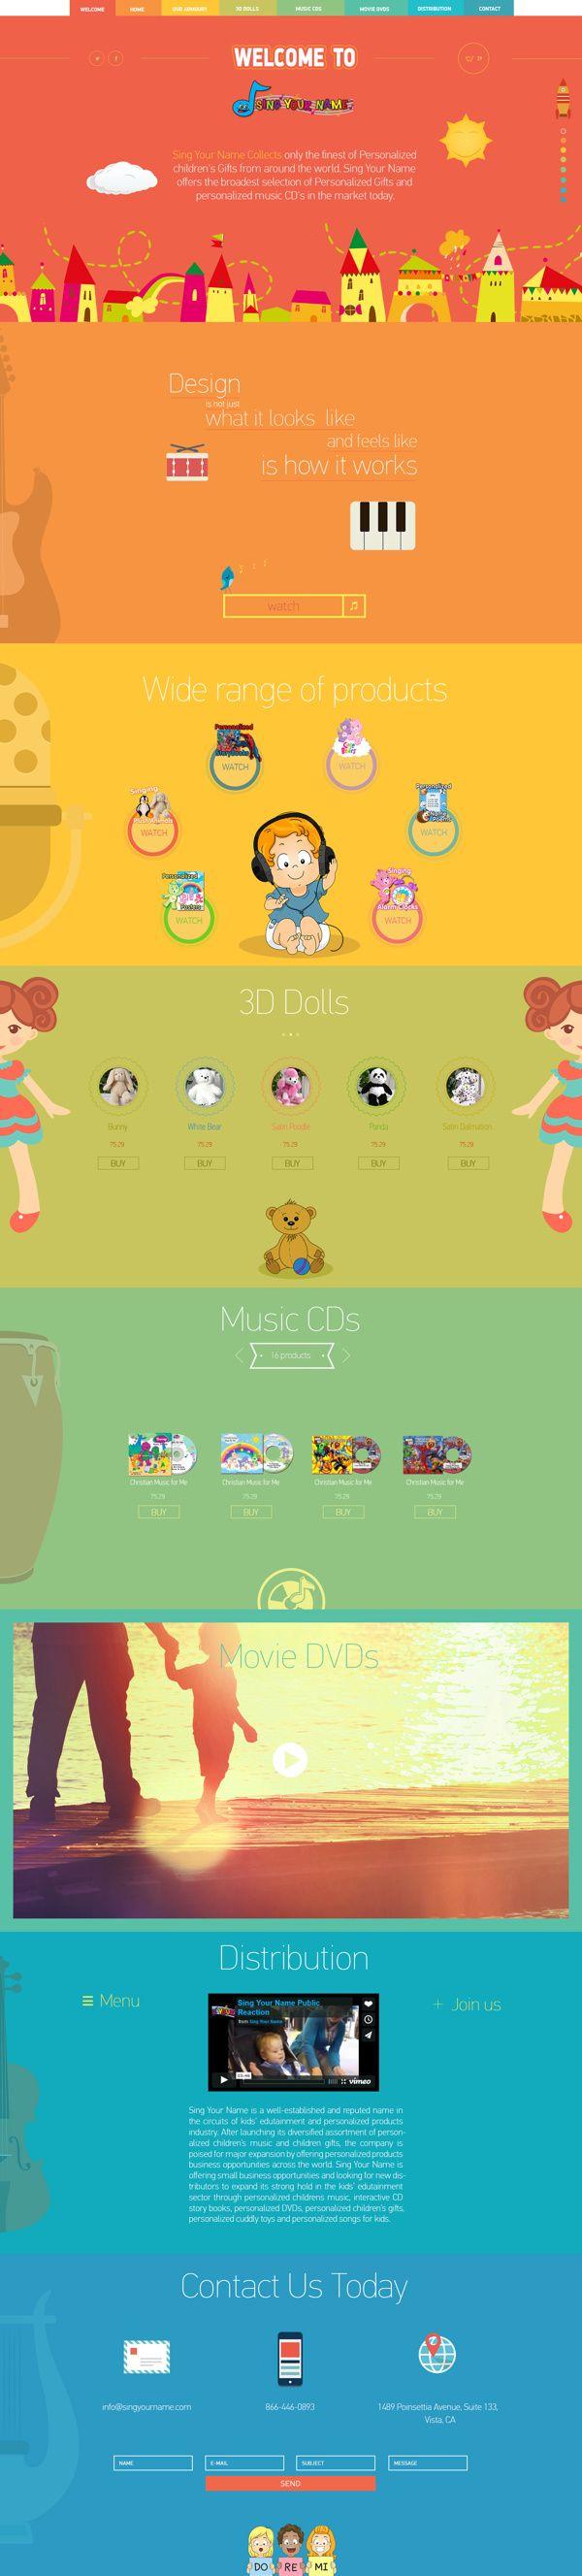 Unique Web Design, Sign Your Name #webdesign #design (http://www.pinterest.com/aldenchong/)